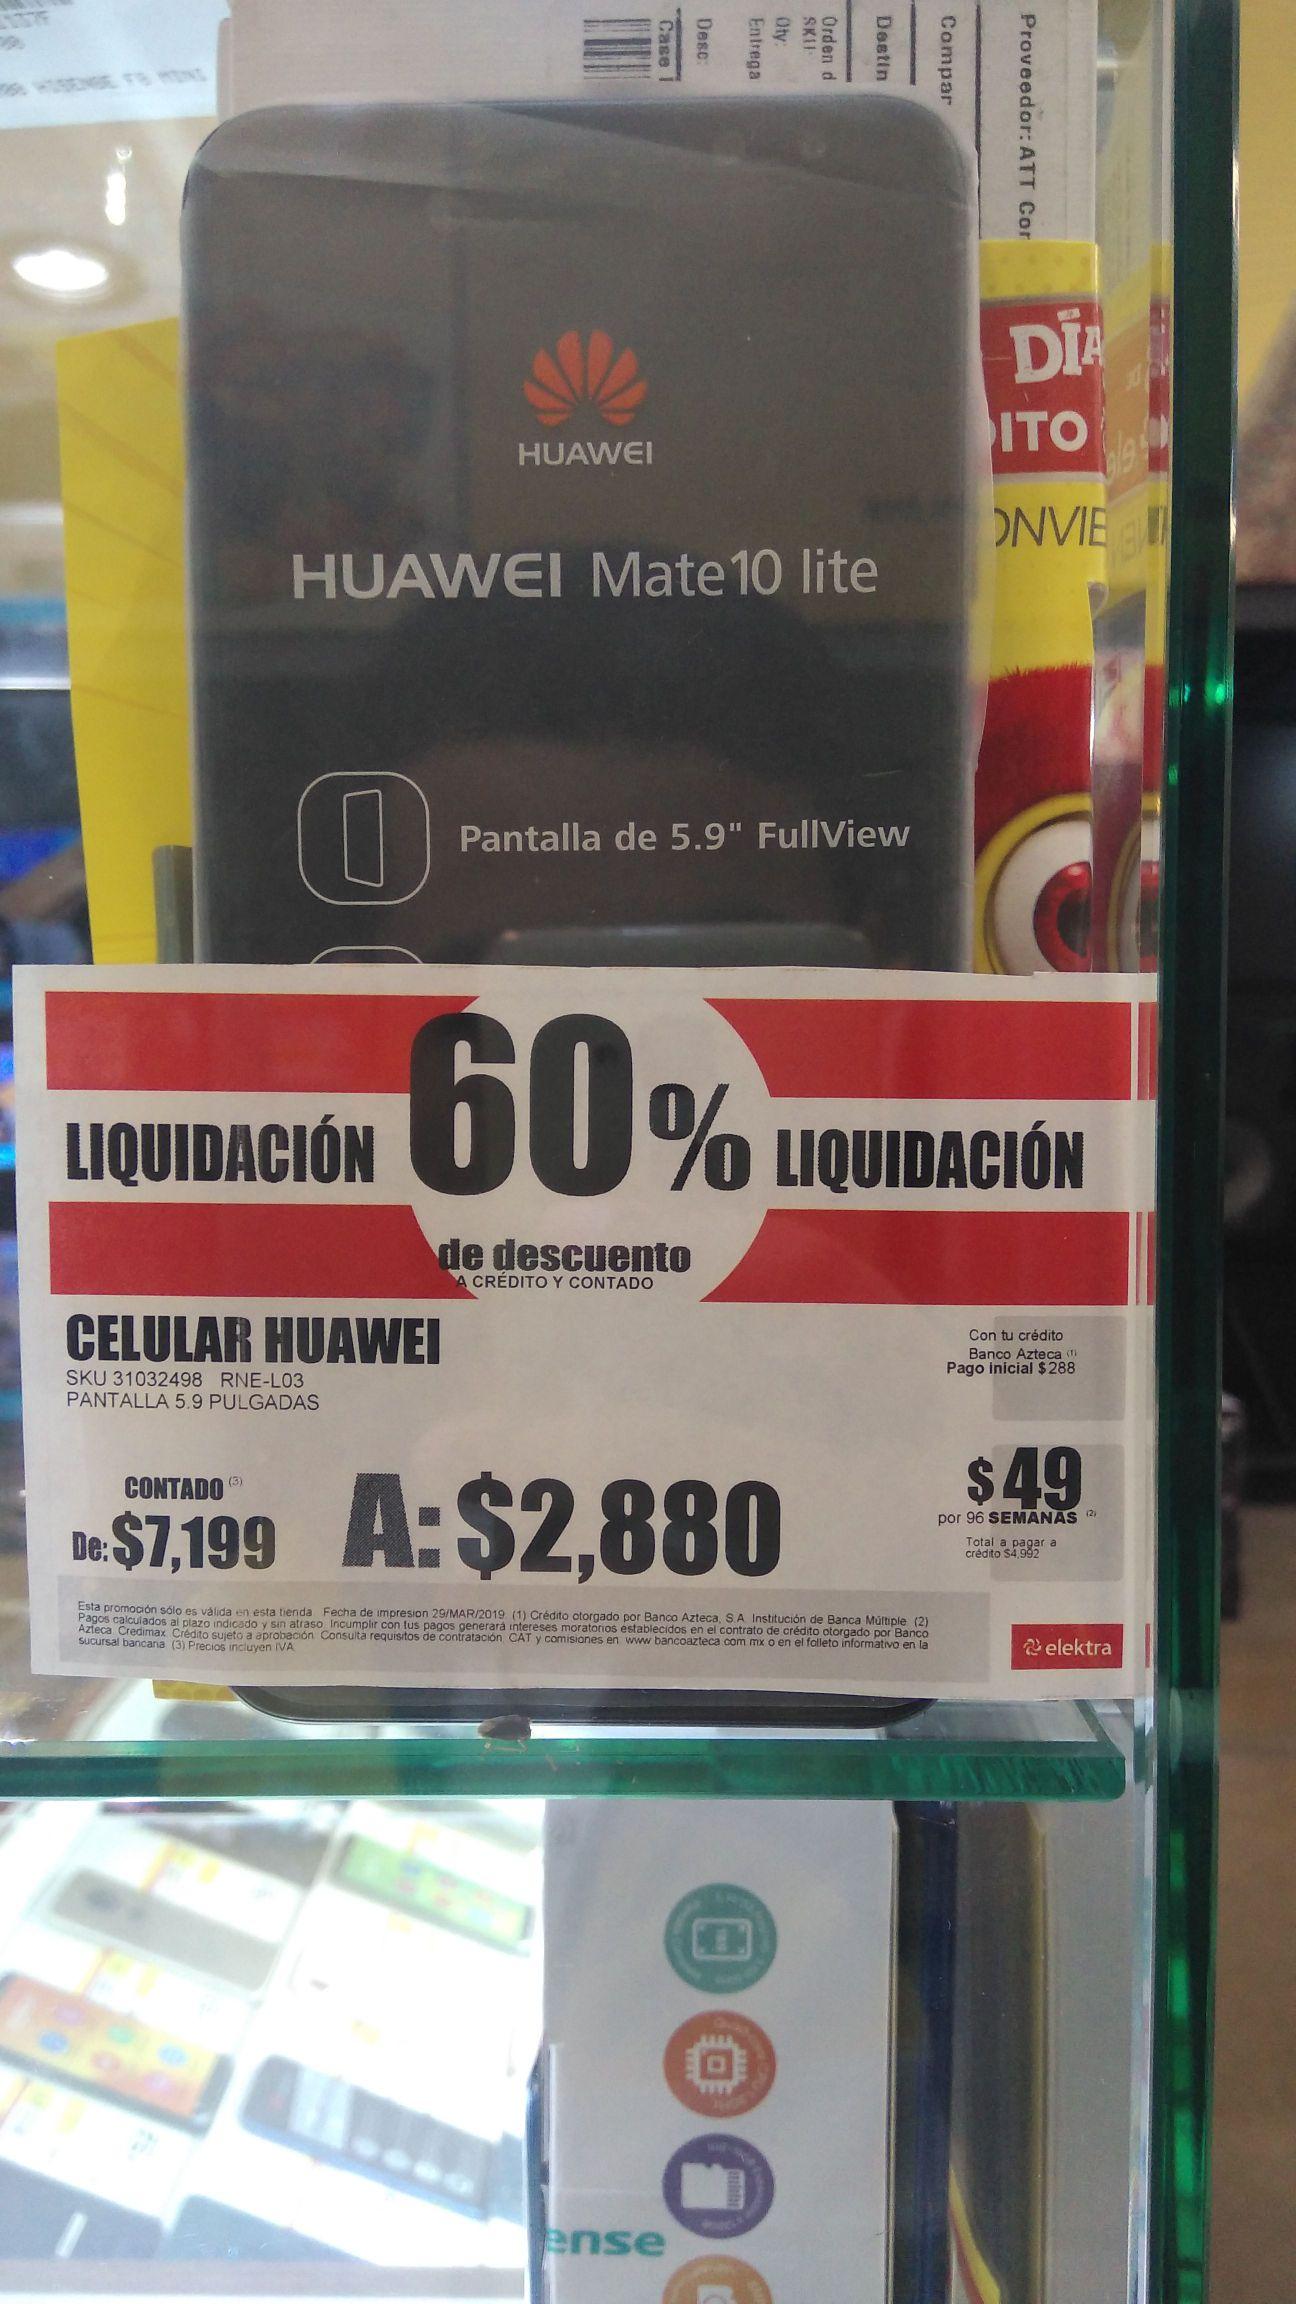 Elektra: ATT HUAWEI MATE 10 LITE de $7,199 A $2,880